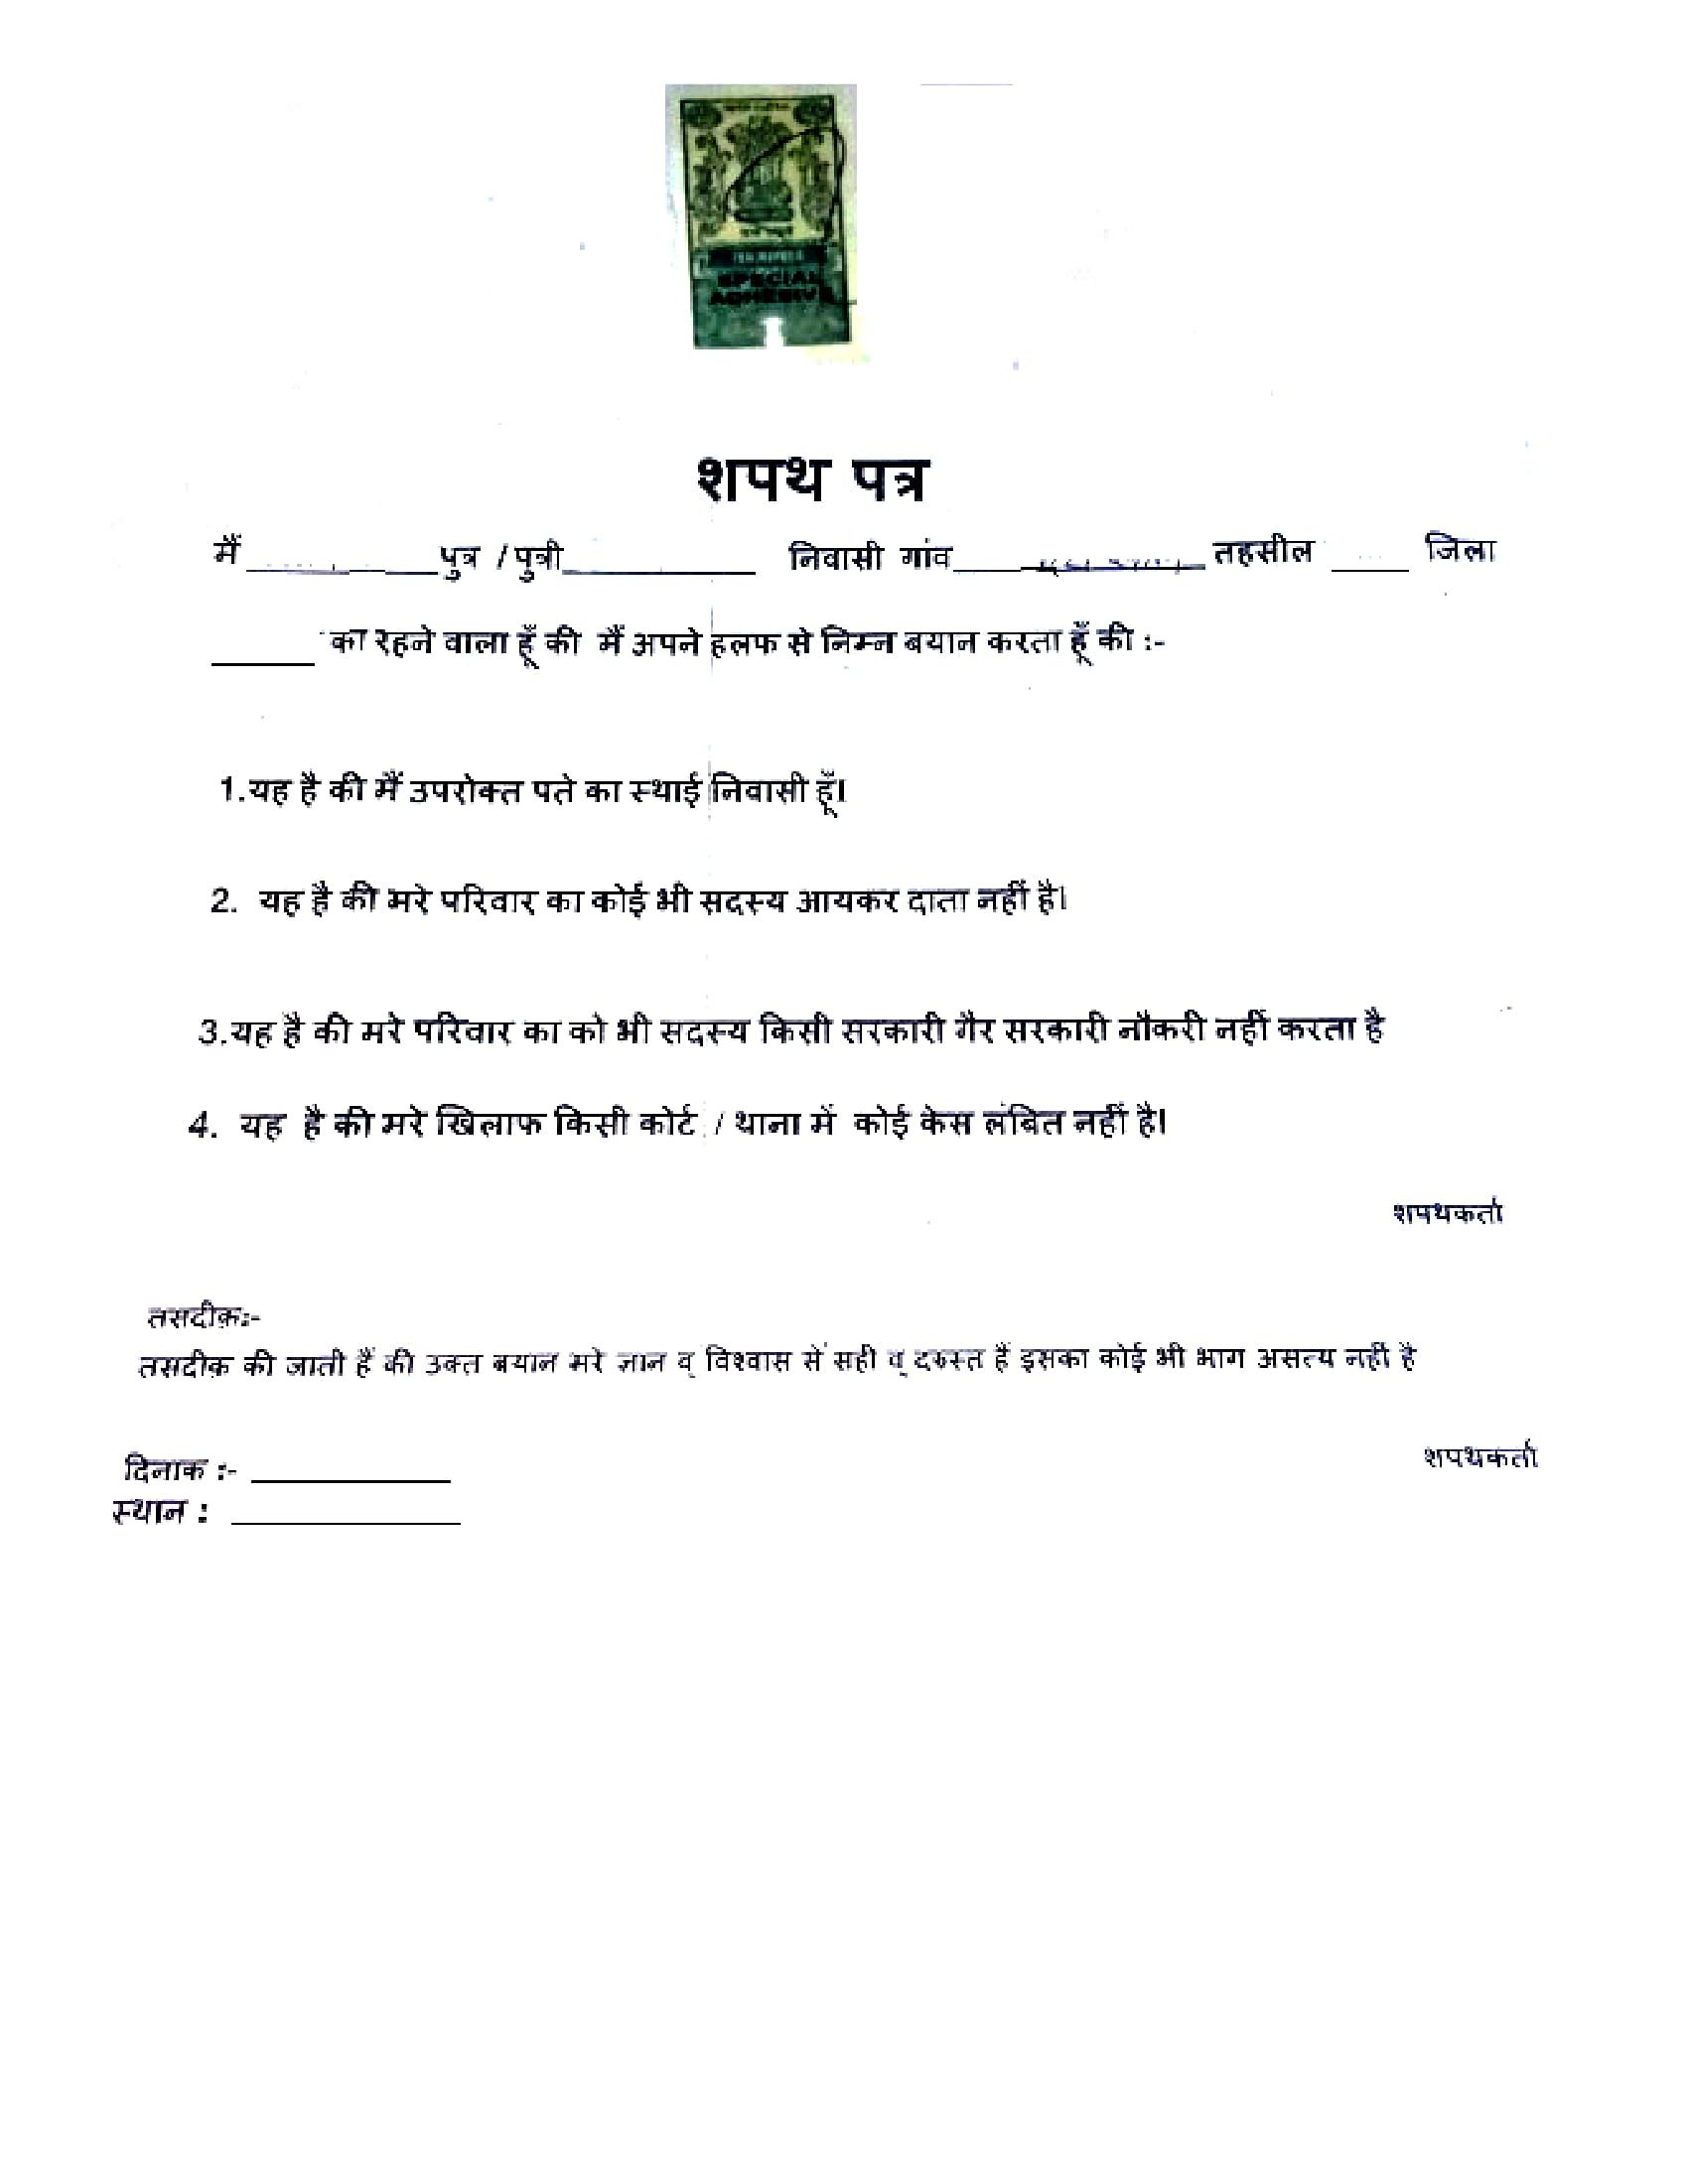 sample resume for teachers in india pdf at resume sample